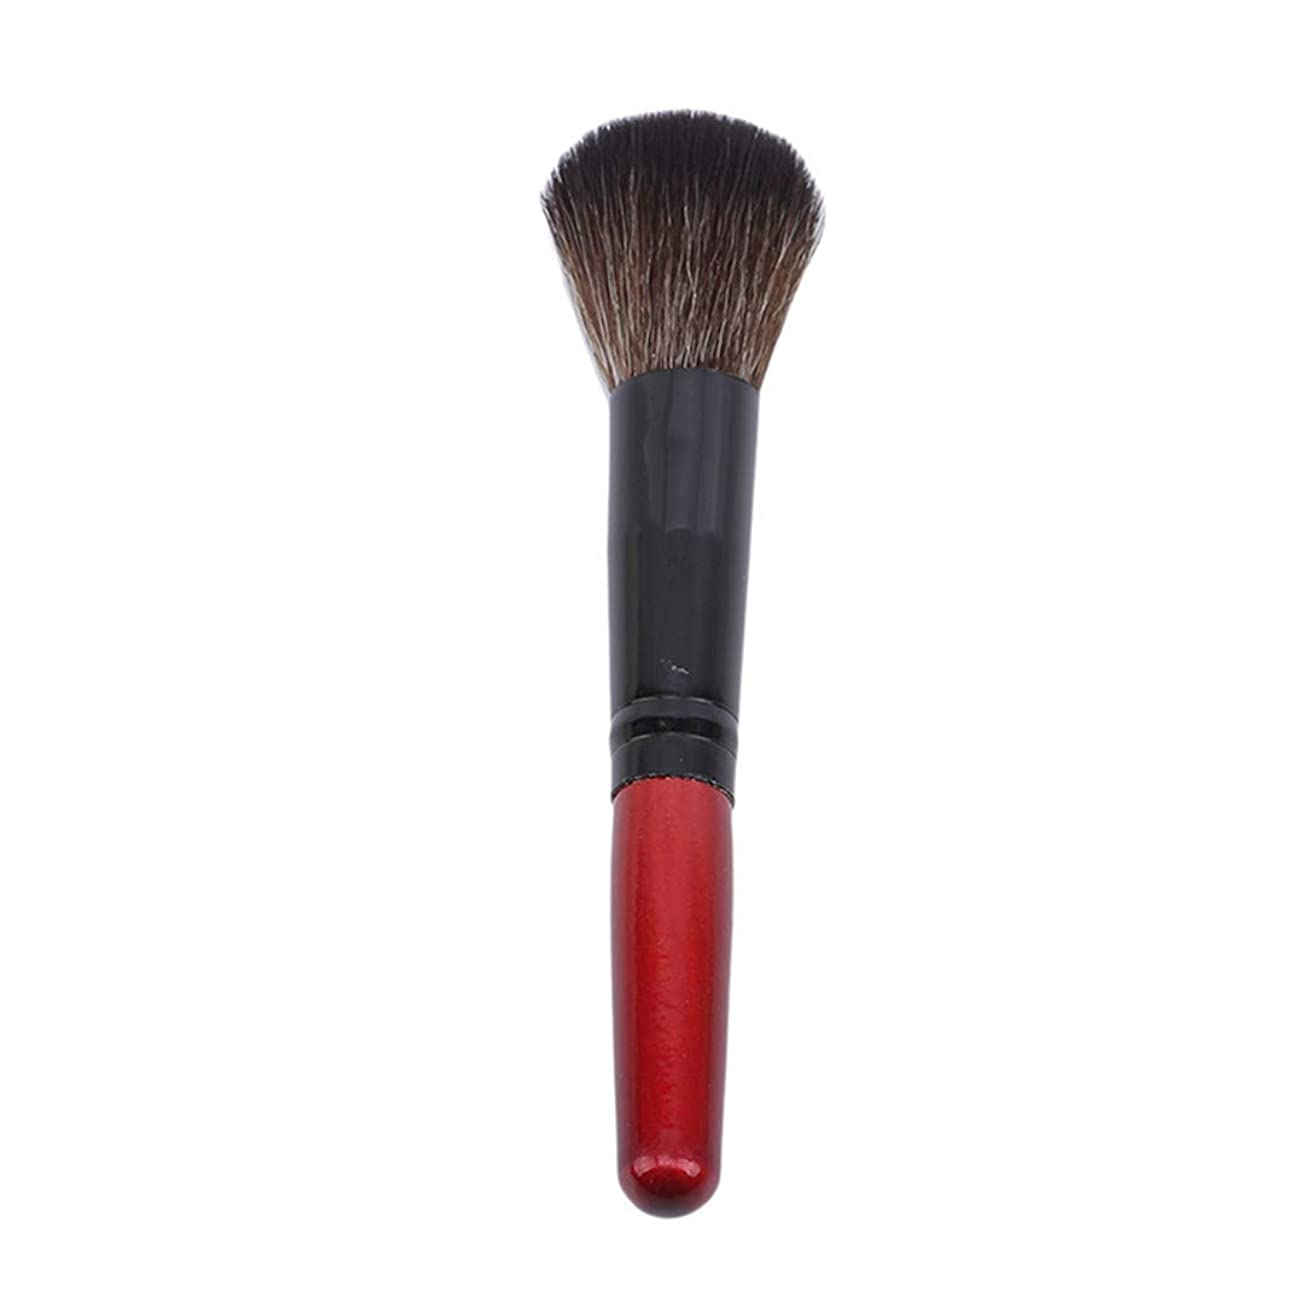 Underleaf 1ピース木製ハンドルファンデーションブラシ化粧品メイクブラシパウダーコンシーラーブラッシュリキッドメイクアップブラシ、赤